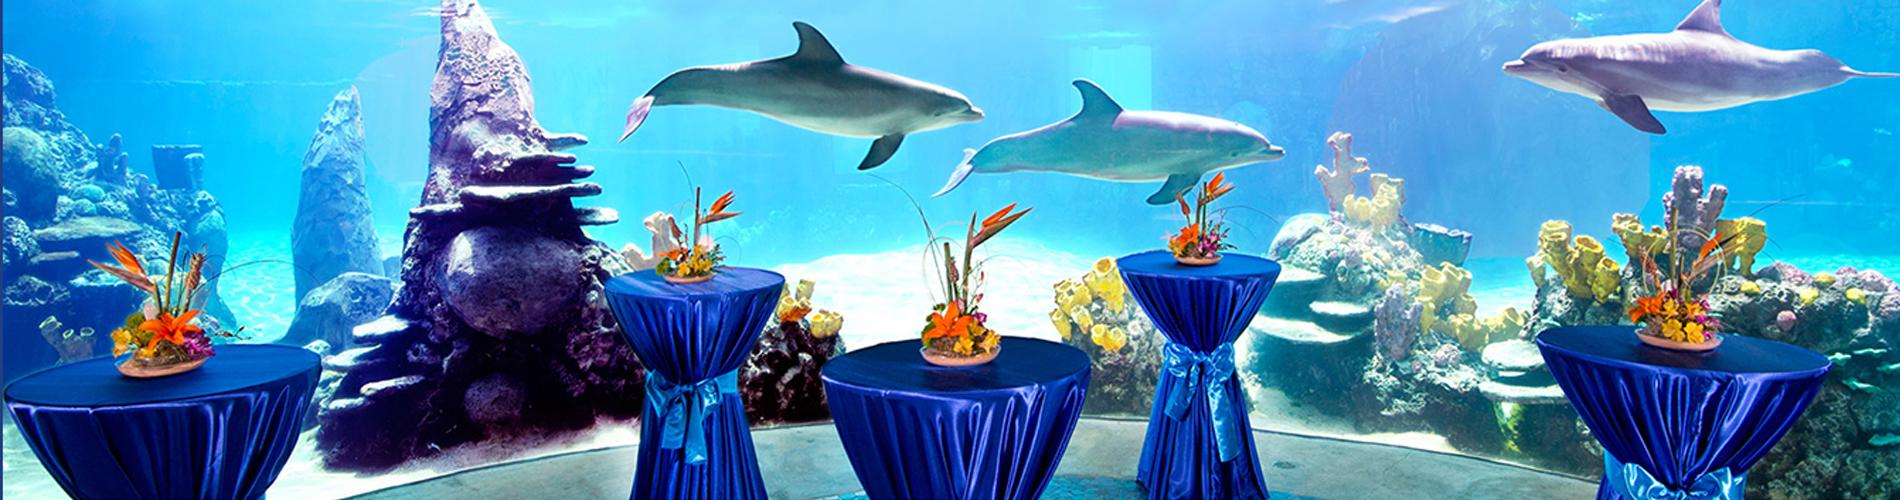 Group events at seaworld san antonio